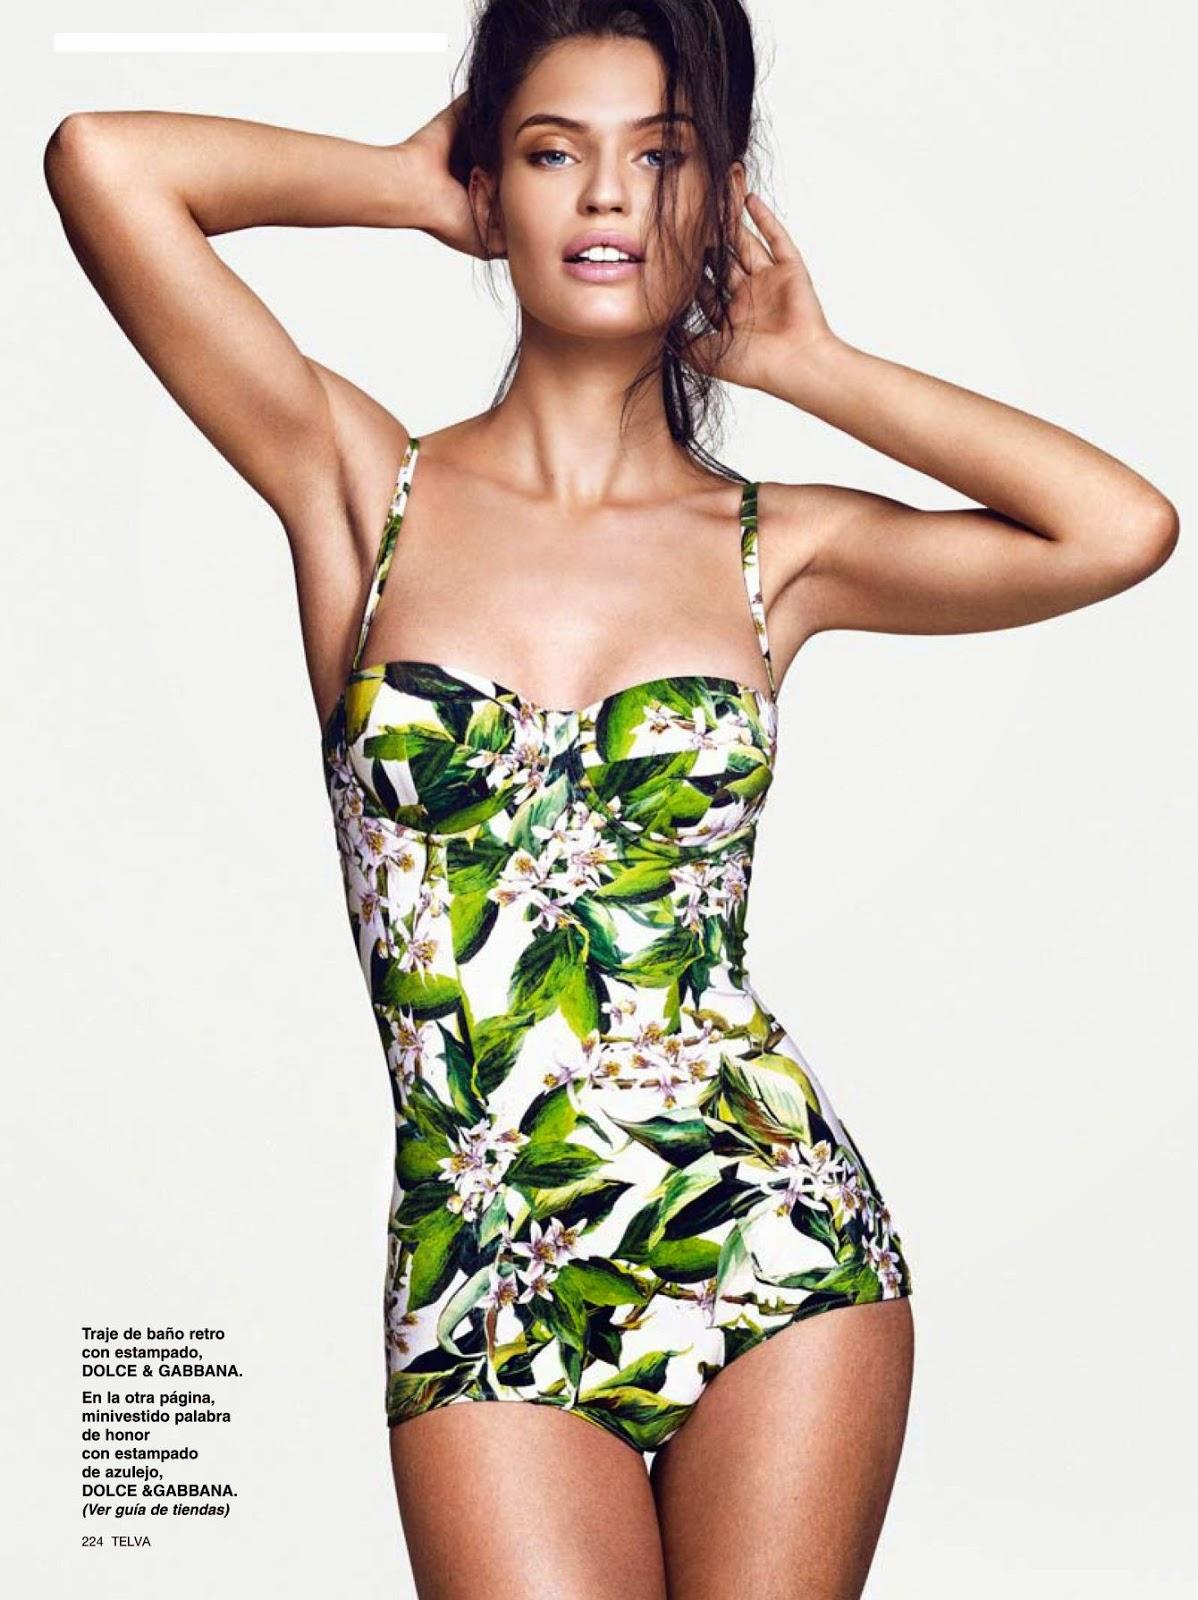 Bianca Balti For Telva Magazine, Spain, July 2014